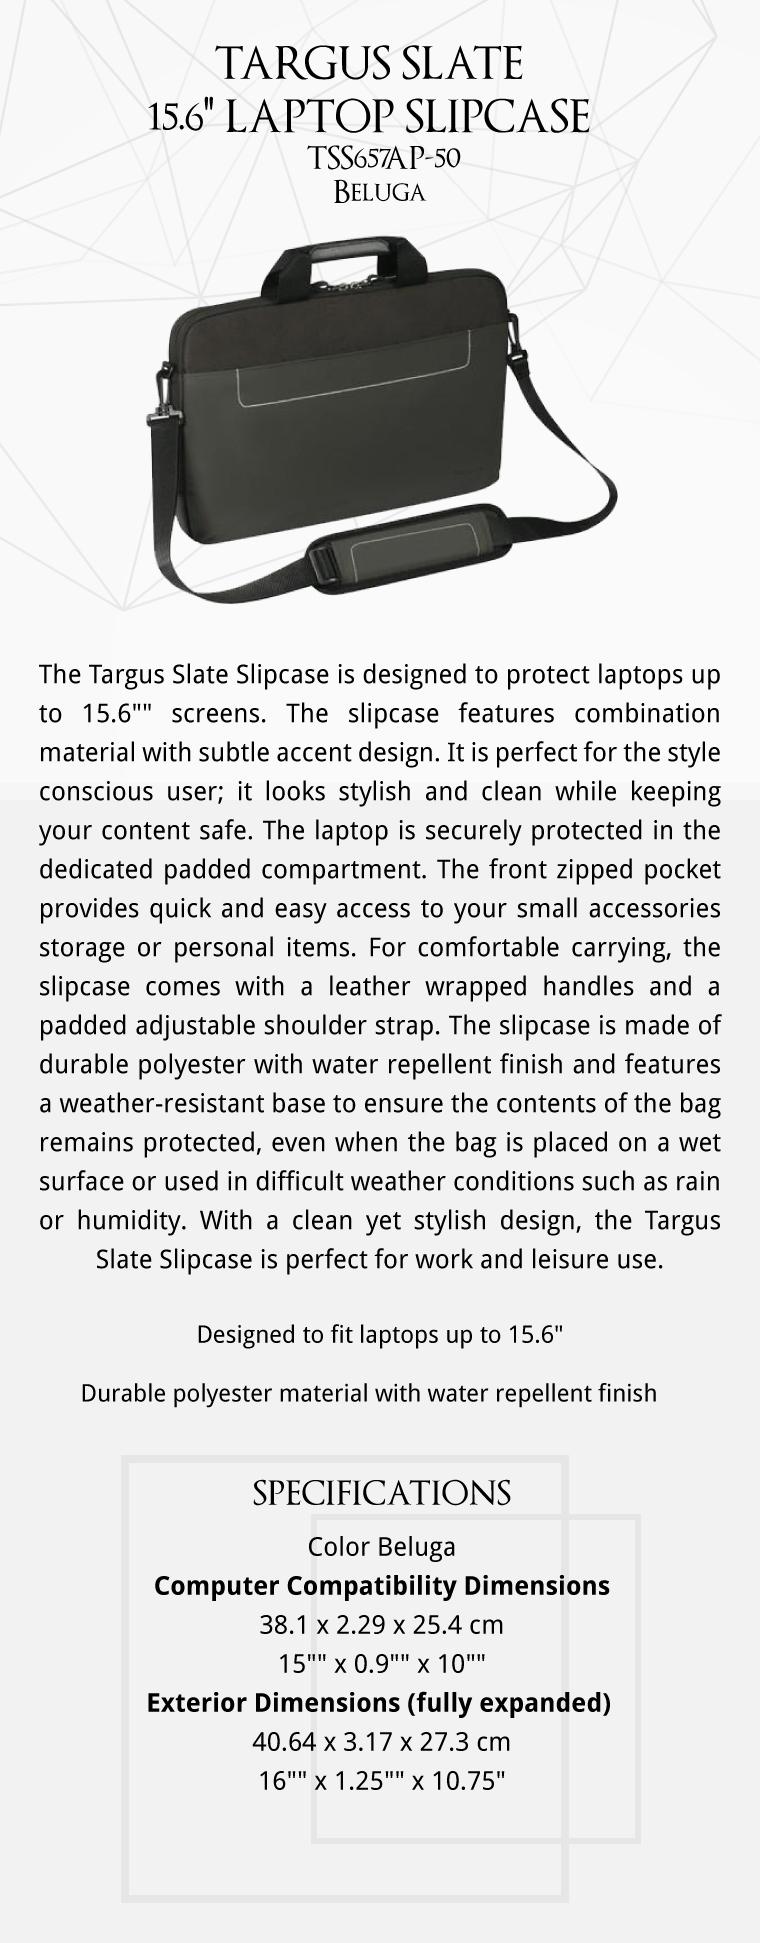 Targus Slate 156inch Laptop Slipcase Tss657ap 50 Beluga Tss657ap